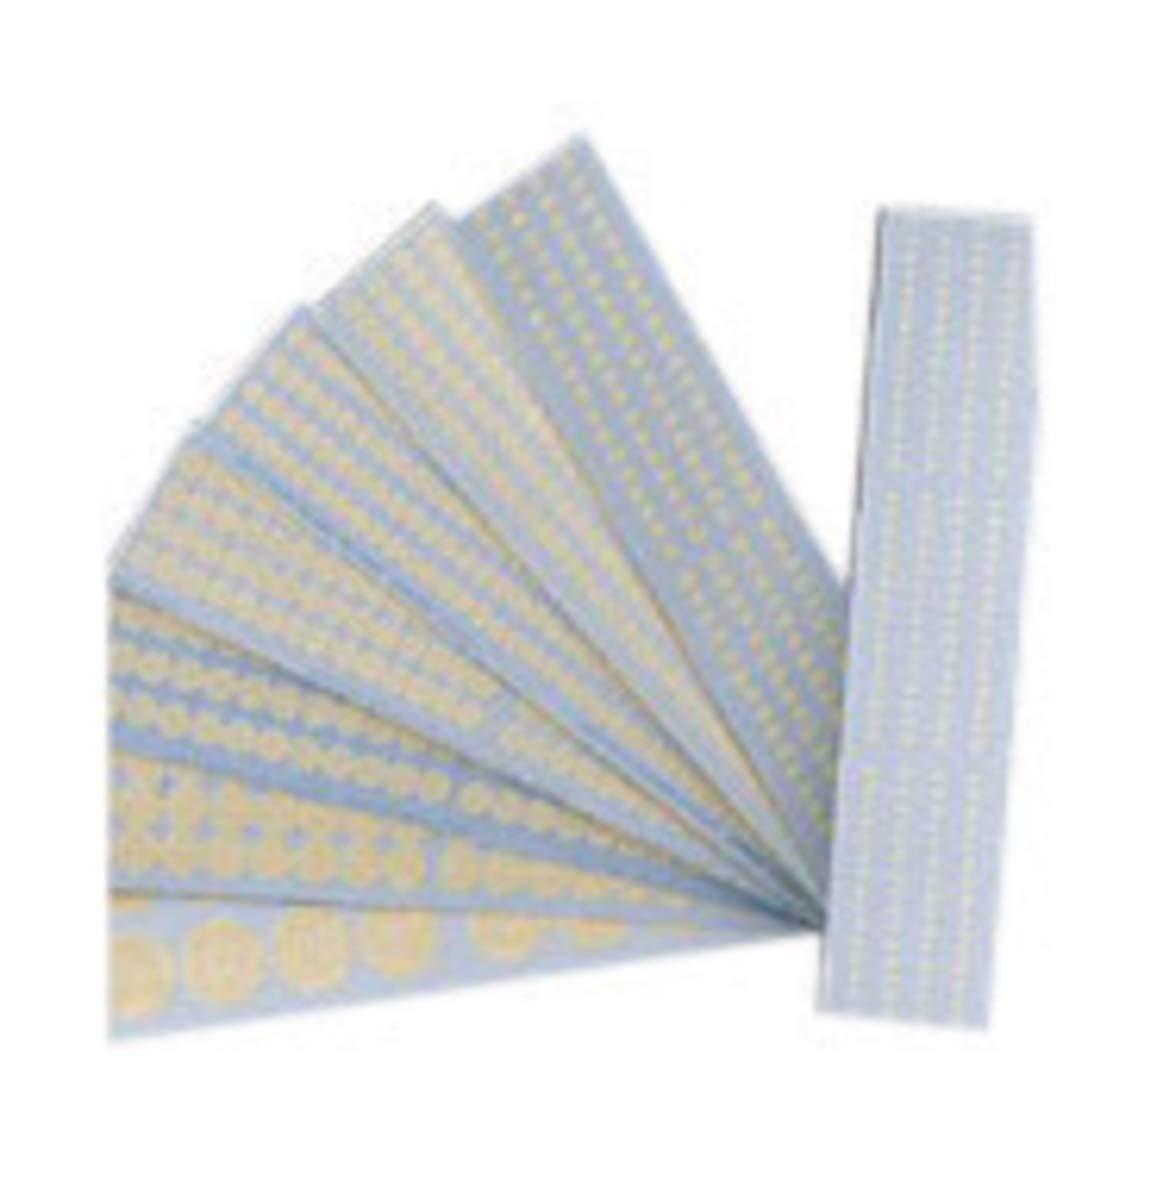 Brady 1/2'' Beige Paper Dots Masking Tape, 10 Card